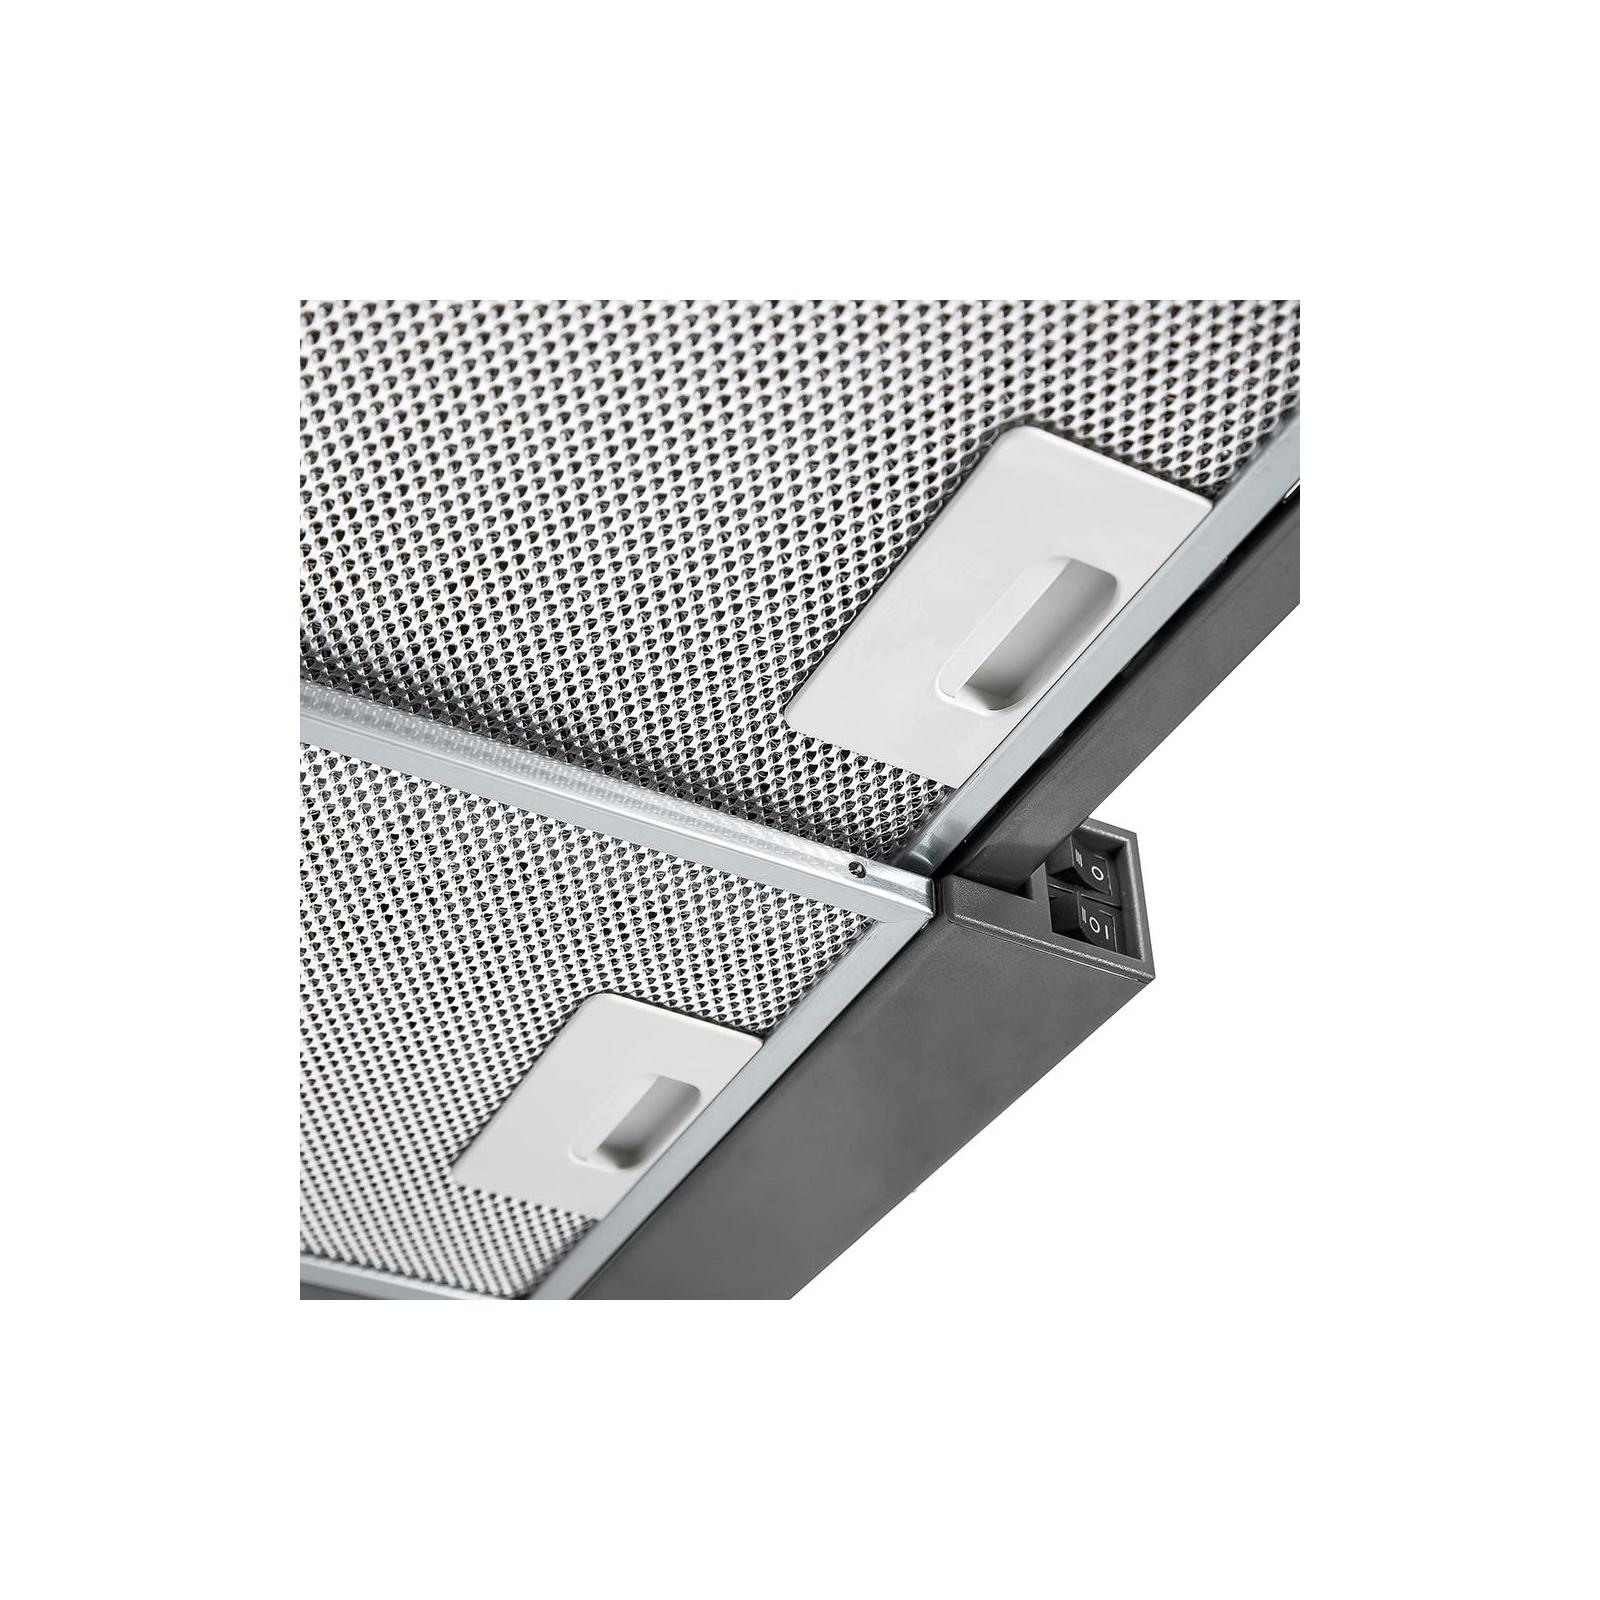 Вытяжка кухонная PERFELLI TL 6612 BL LED изображение 5